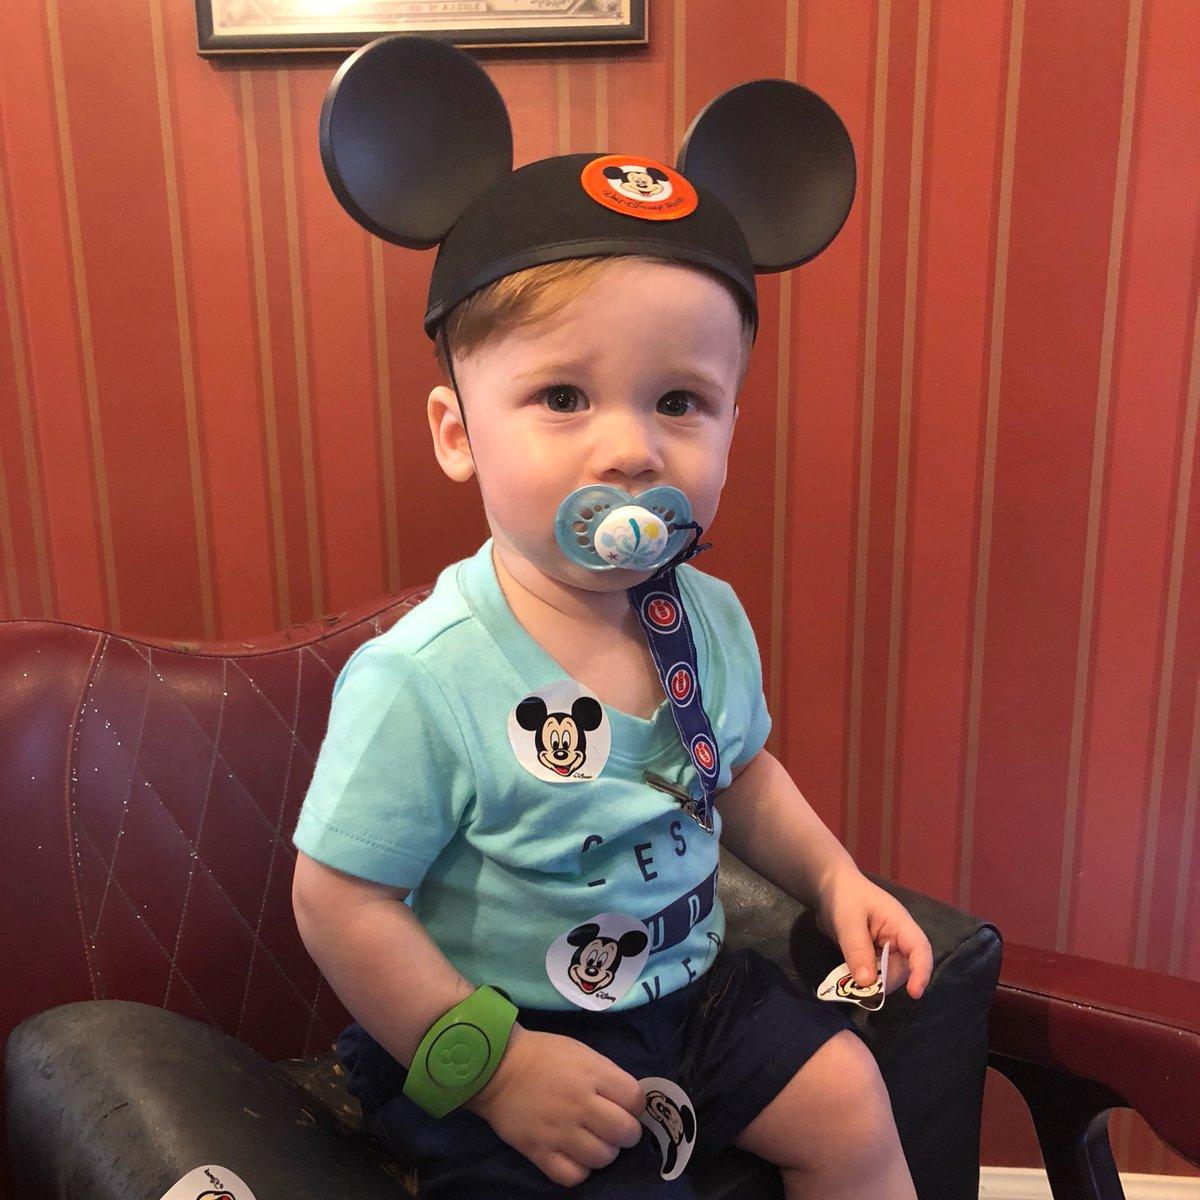 Walt Disney World Today On Twitter Well Definitely Make Sure To